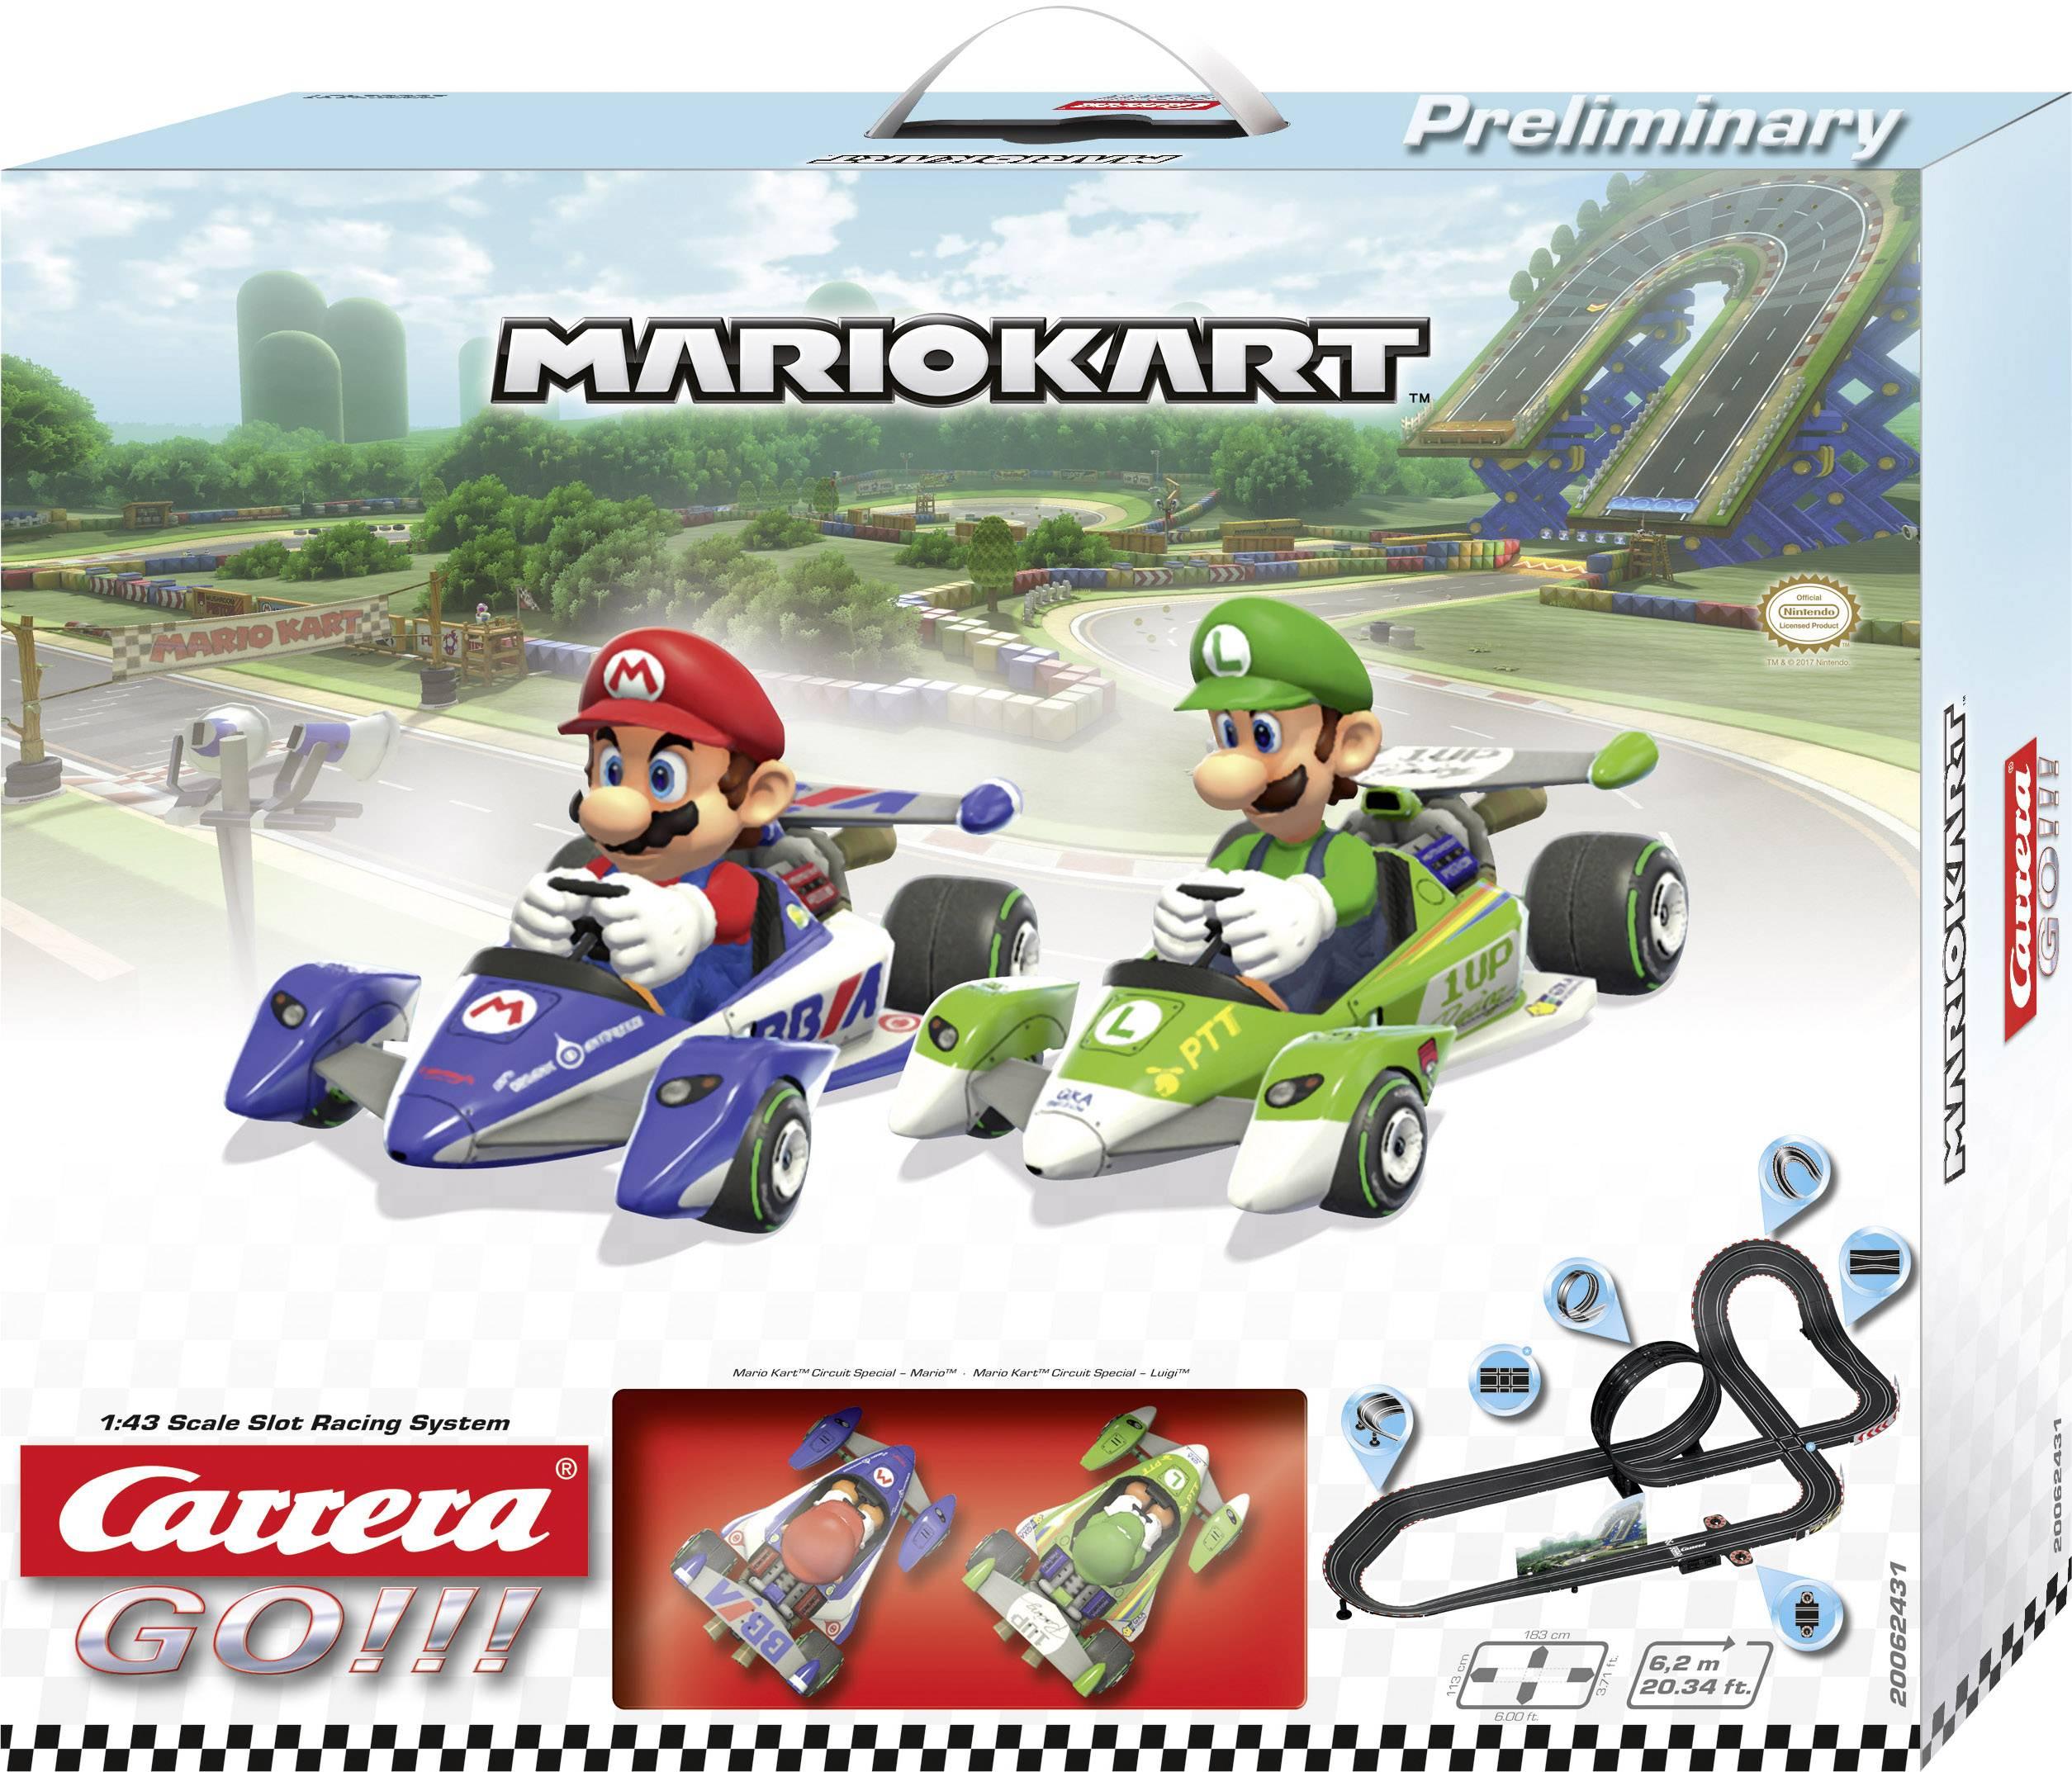 Autodráha, štartovacia sada Carrera Mario Kart™ 20062431, druh autodráhy GO!!!